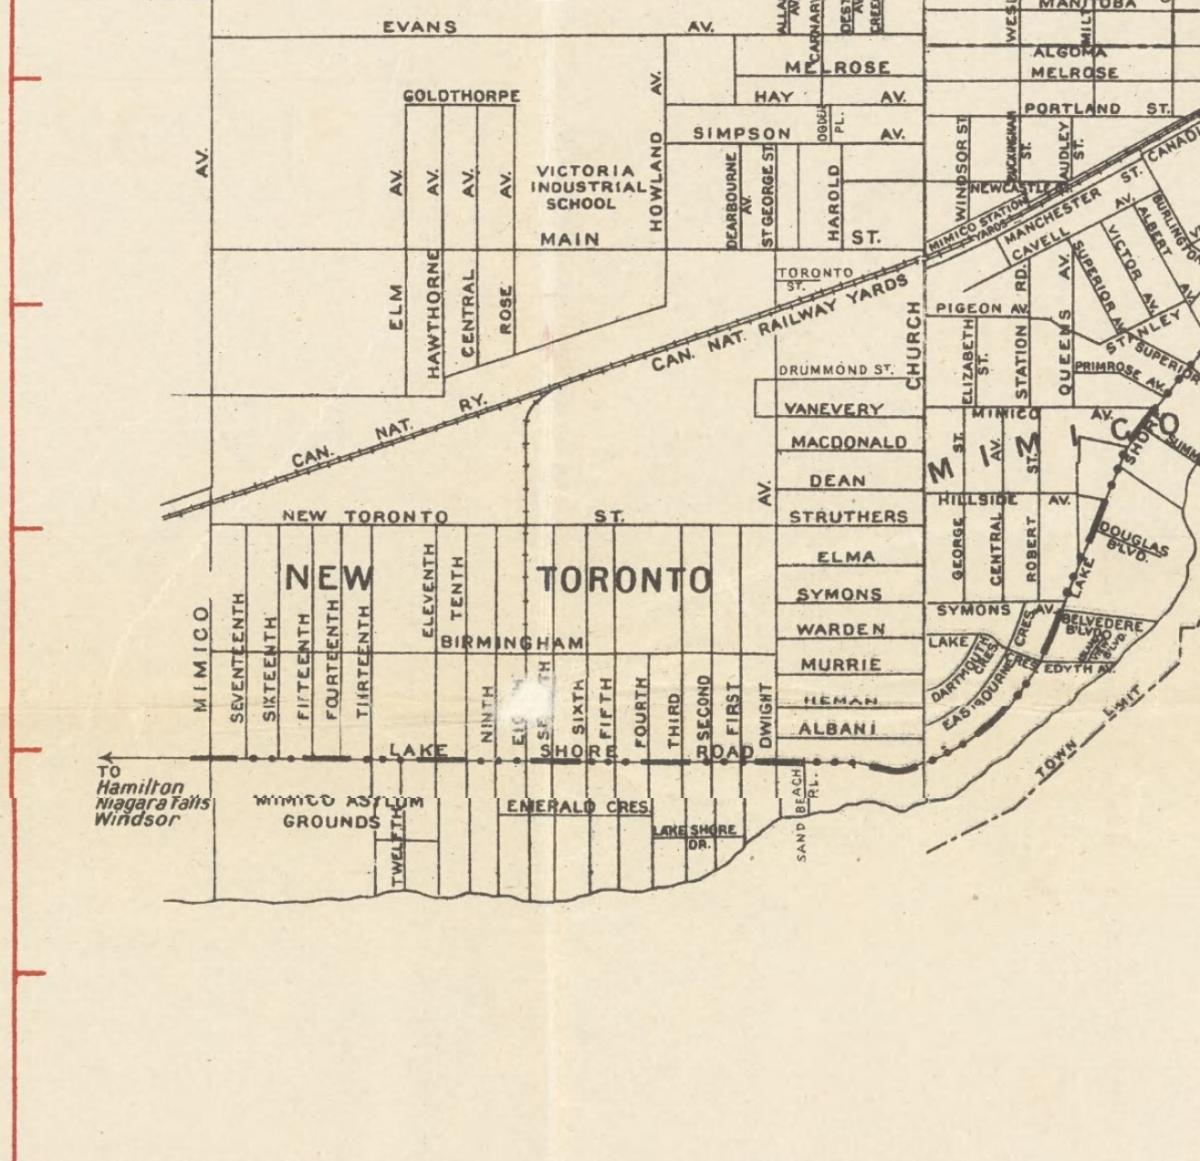 1921 Lakeshore west2